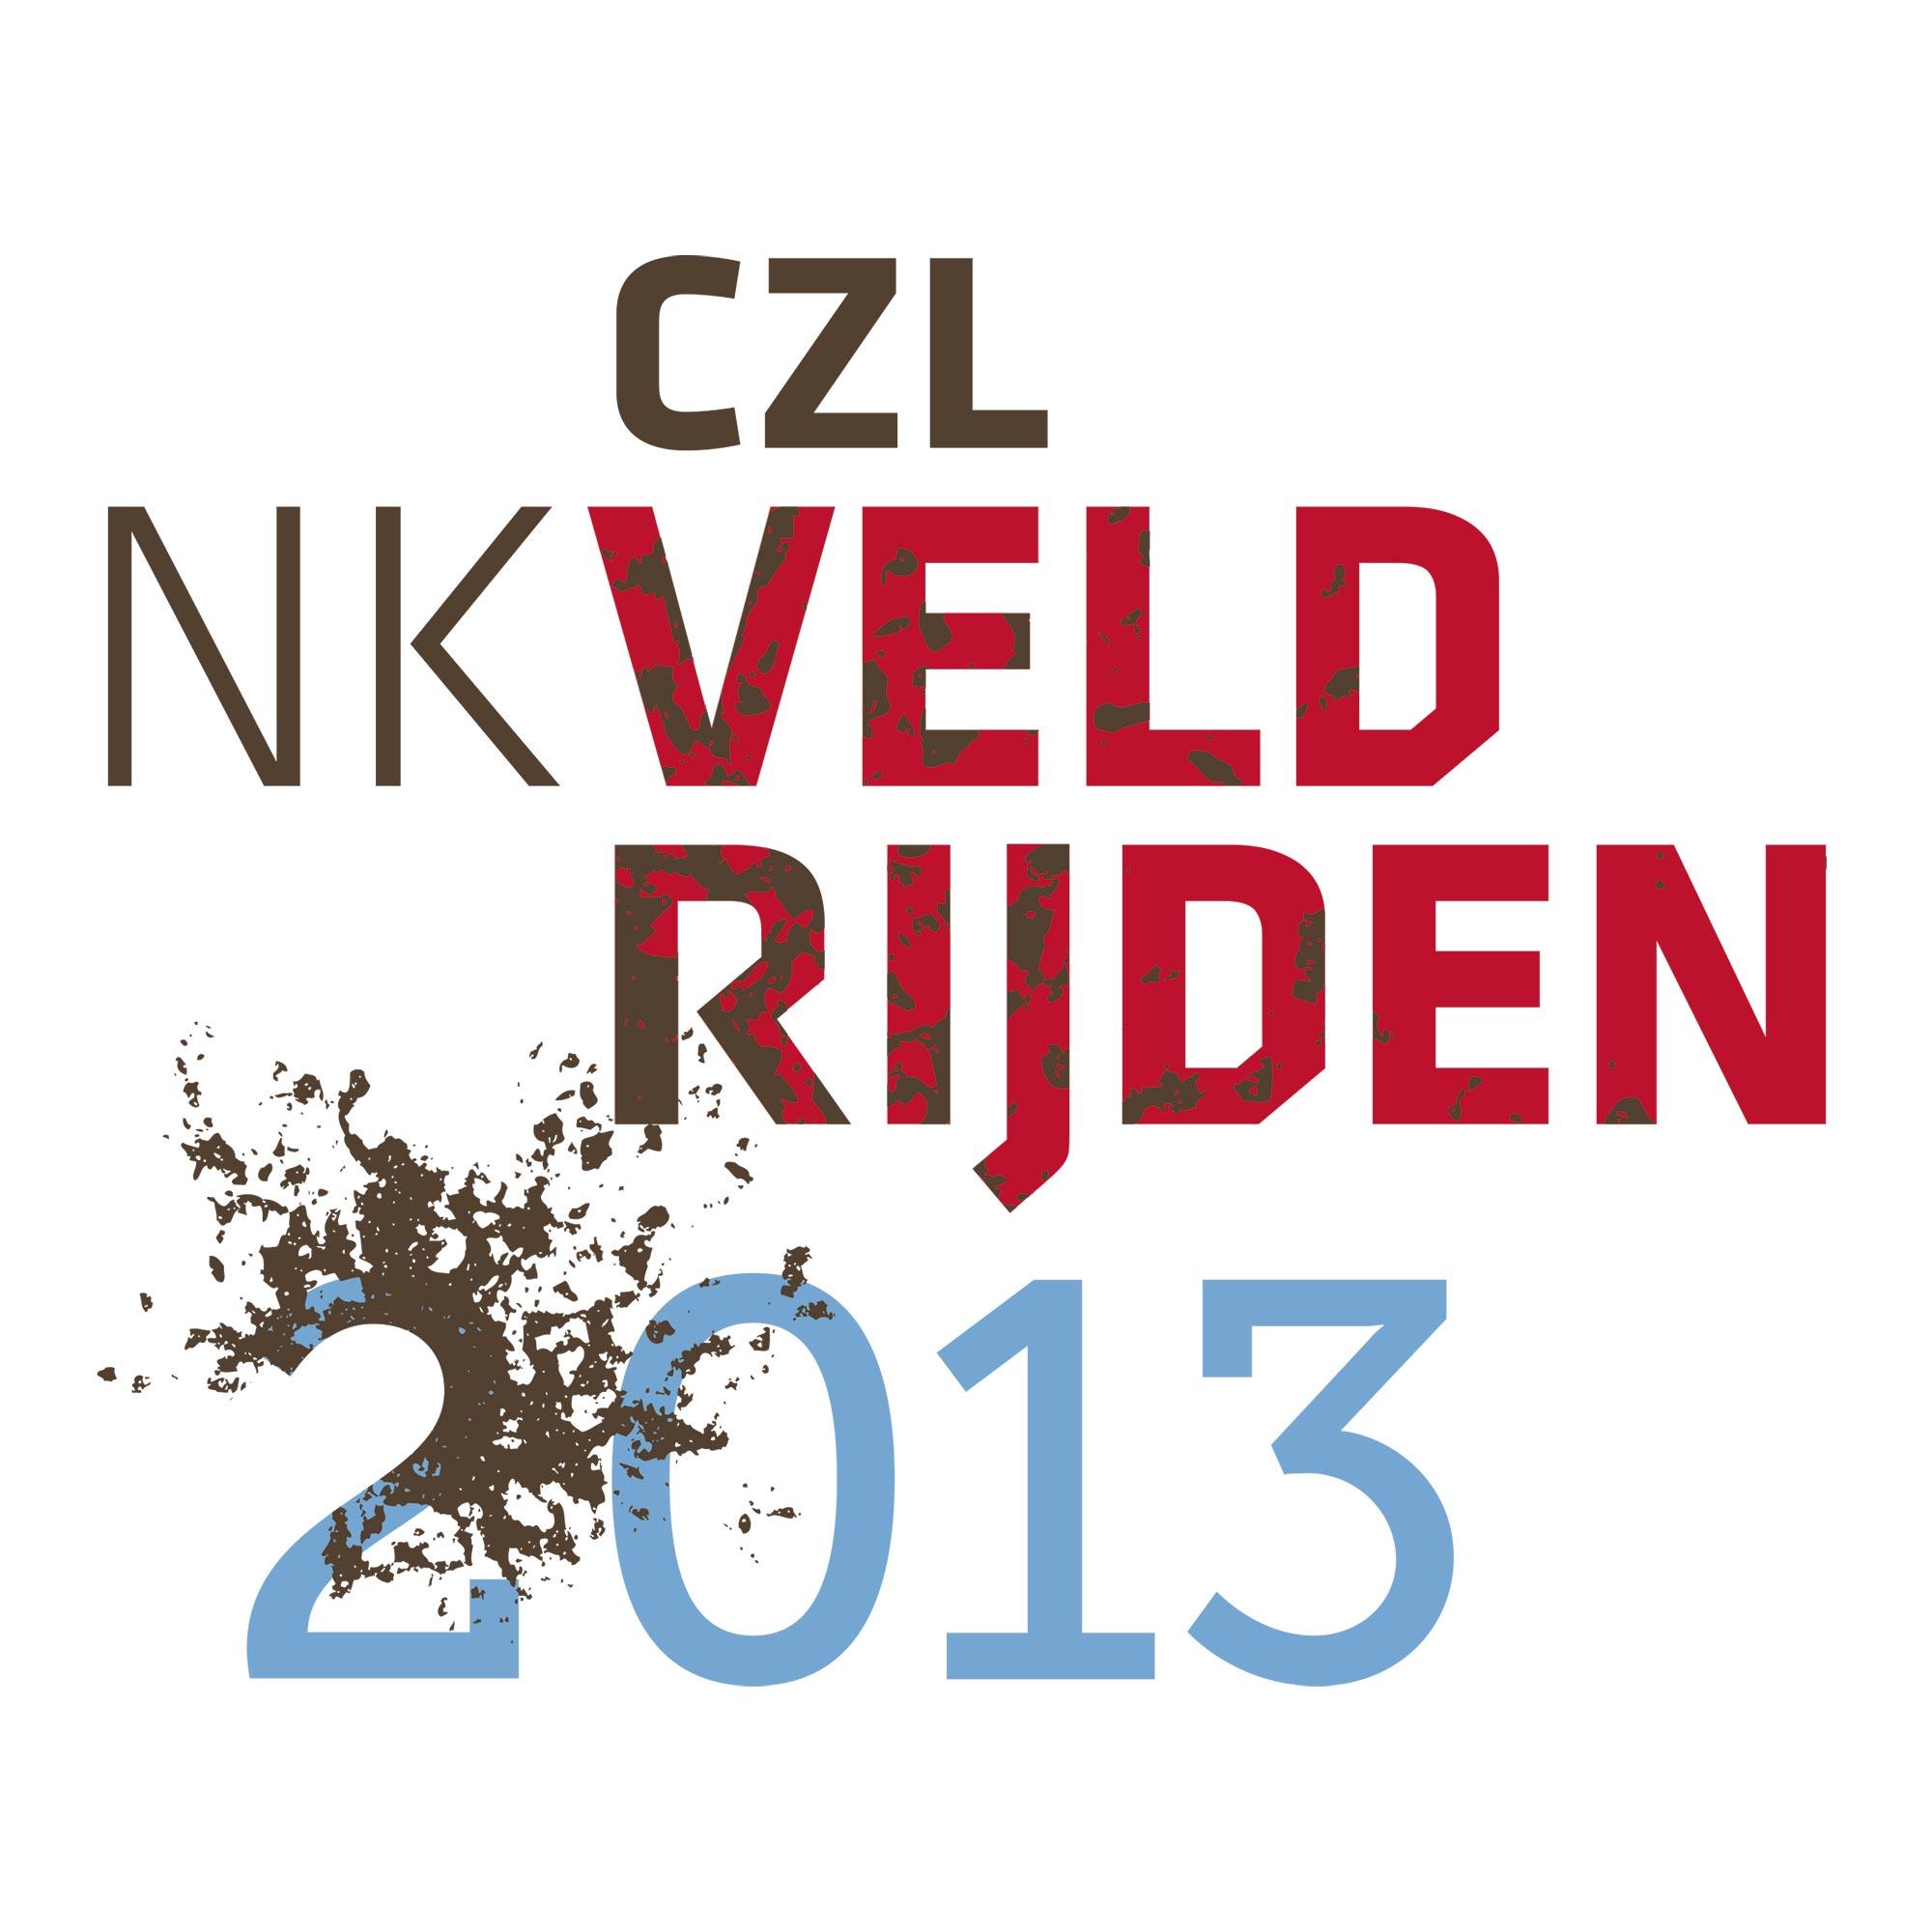 NK Veldrijden logo ontwerp JAgd